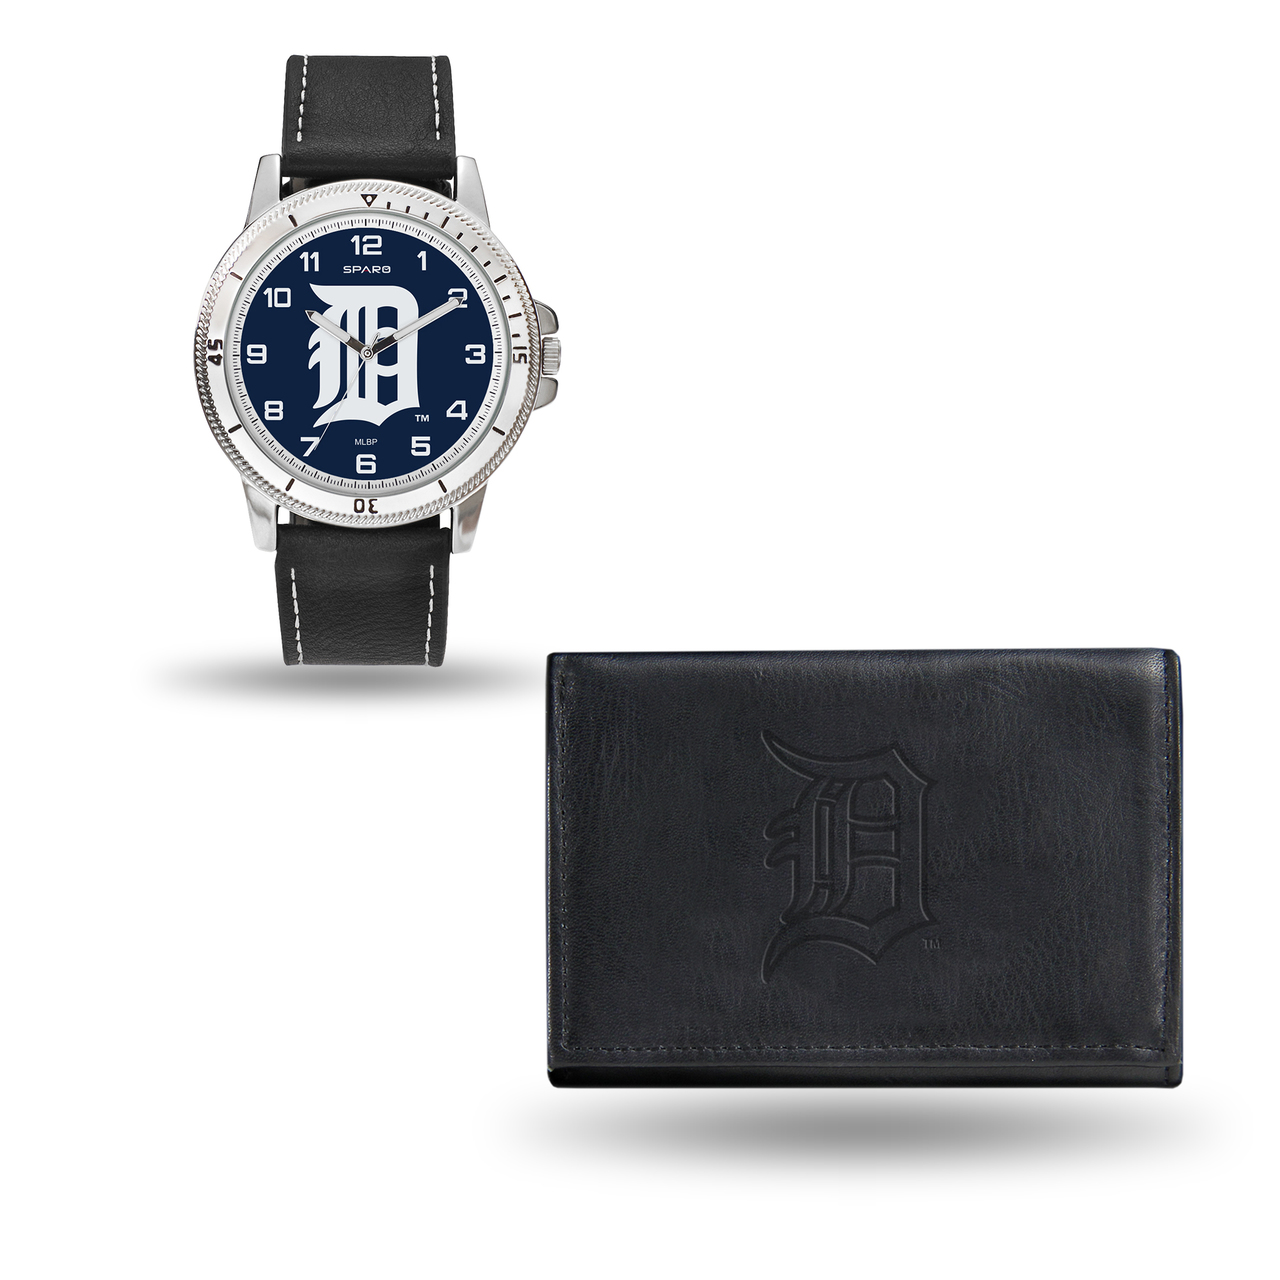 Detroit Tigers MENS Black Watch and Wallet - image 1 de 1